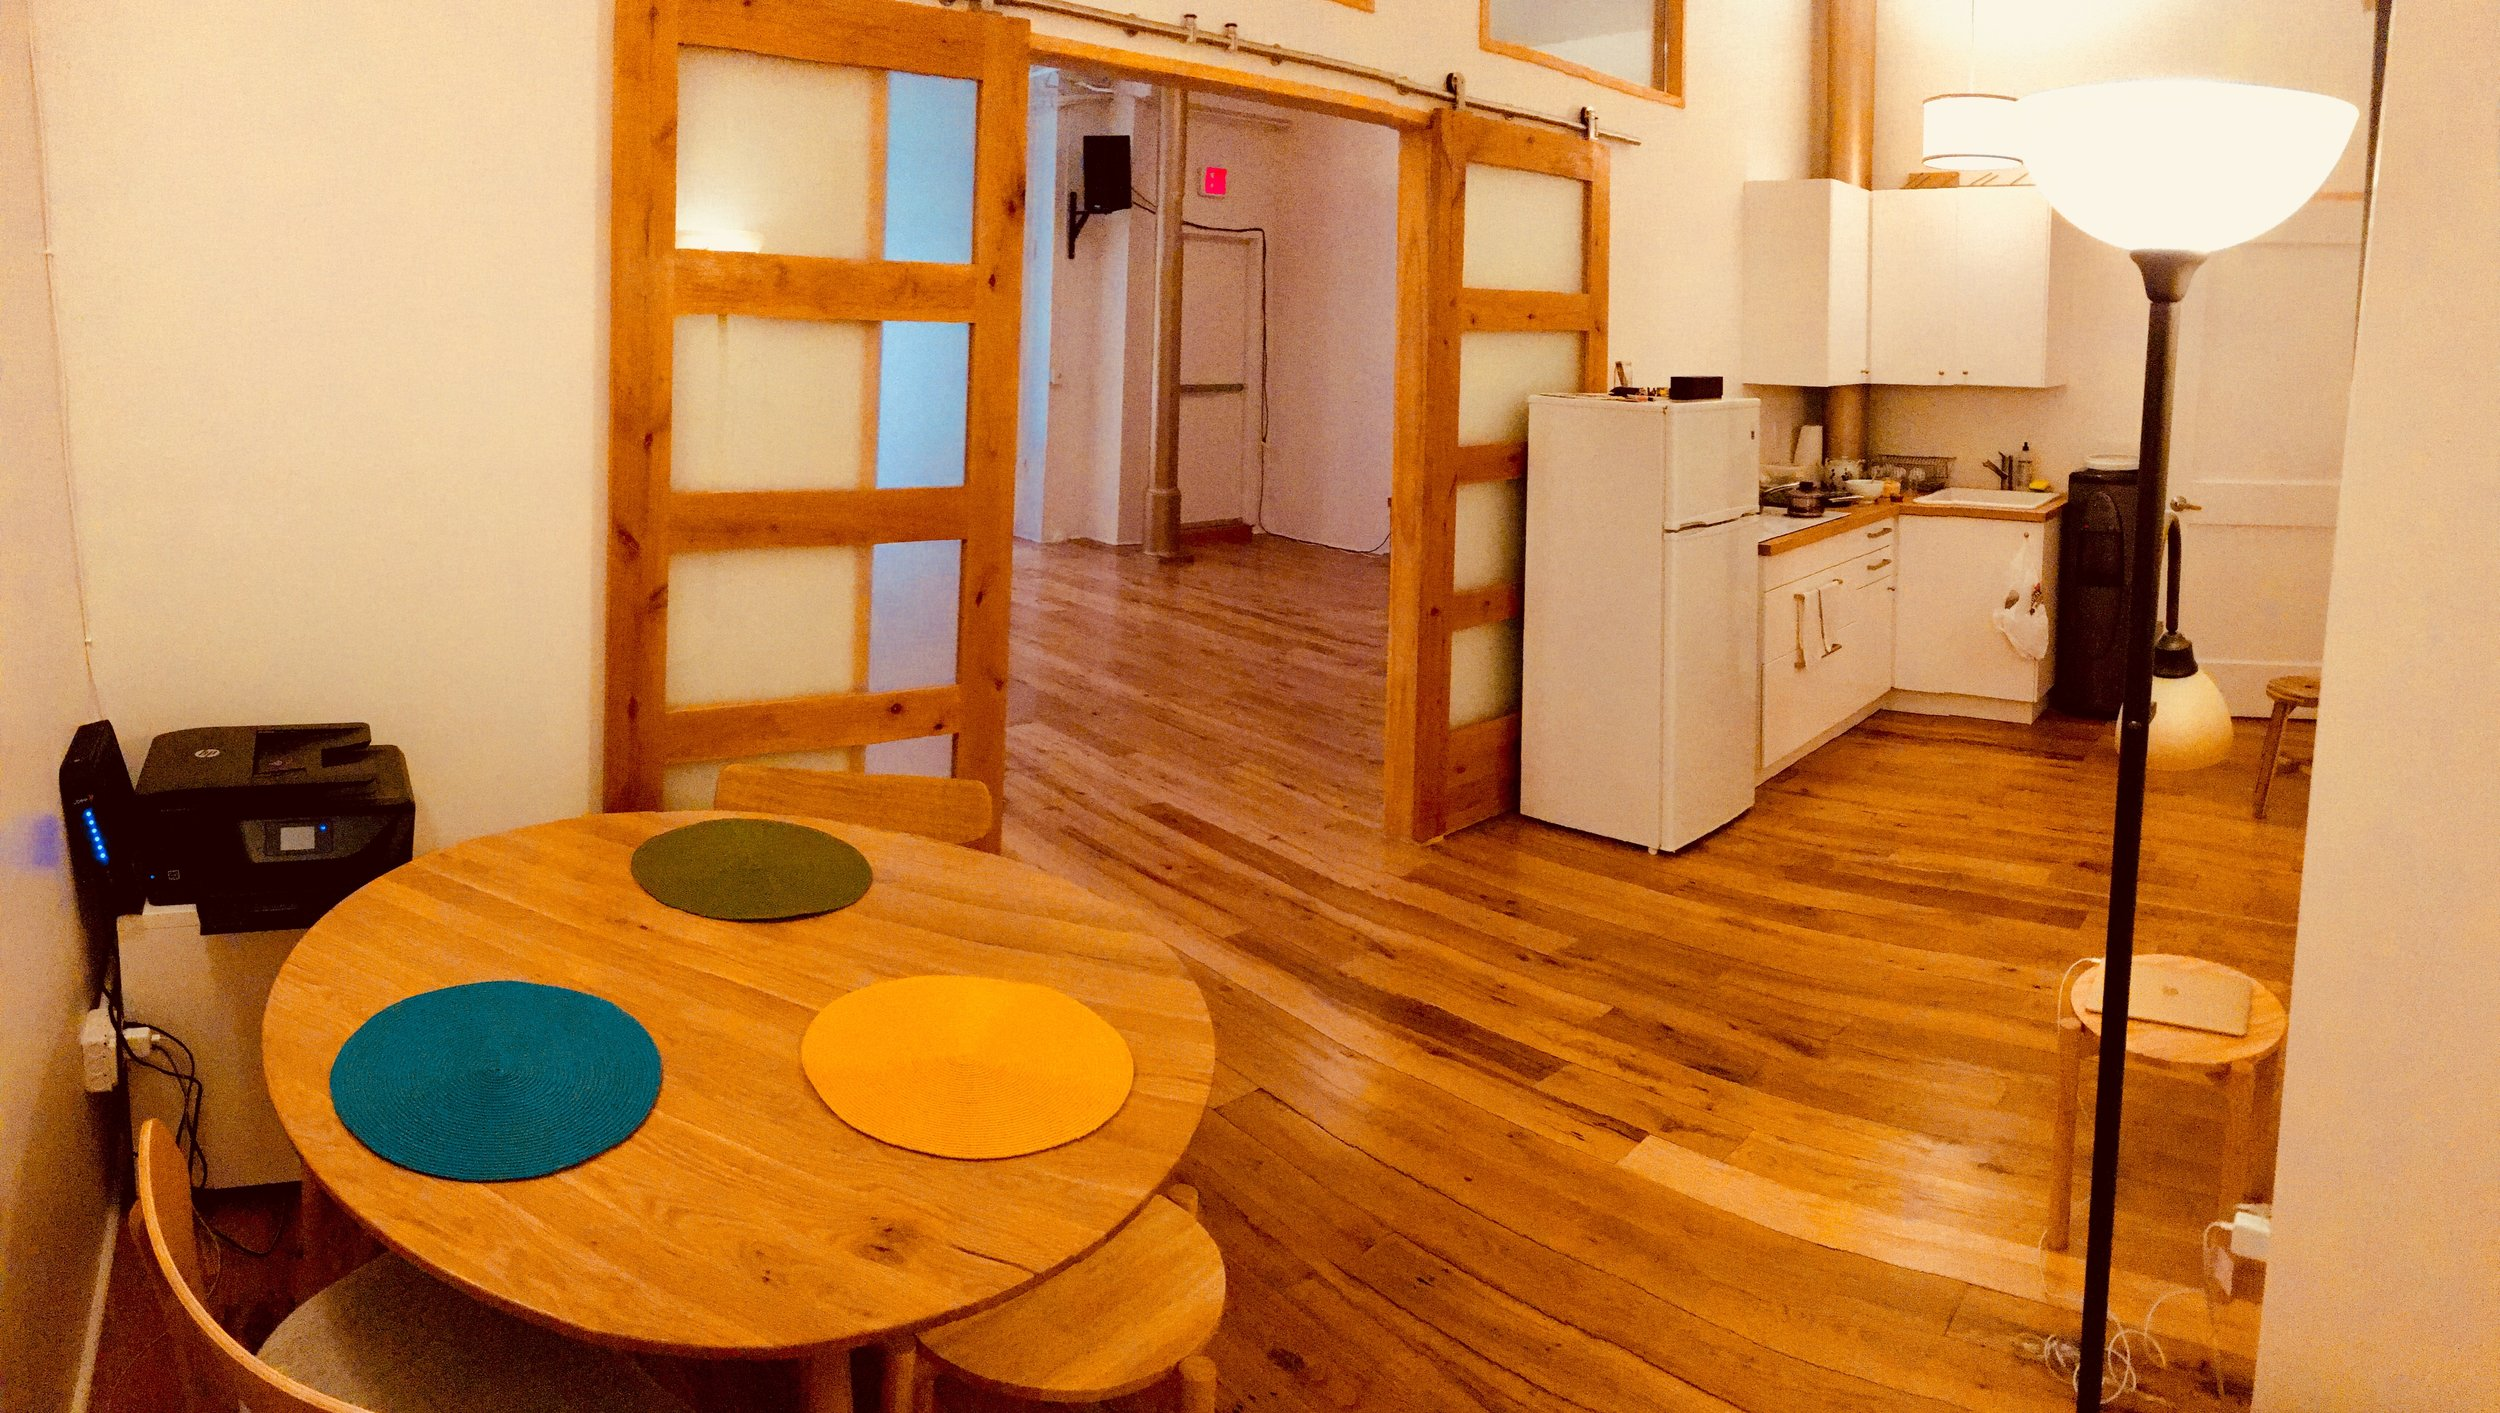 padma-nyc-kitchen-rental.jpg